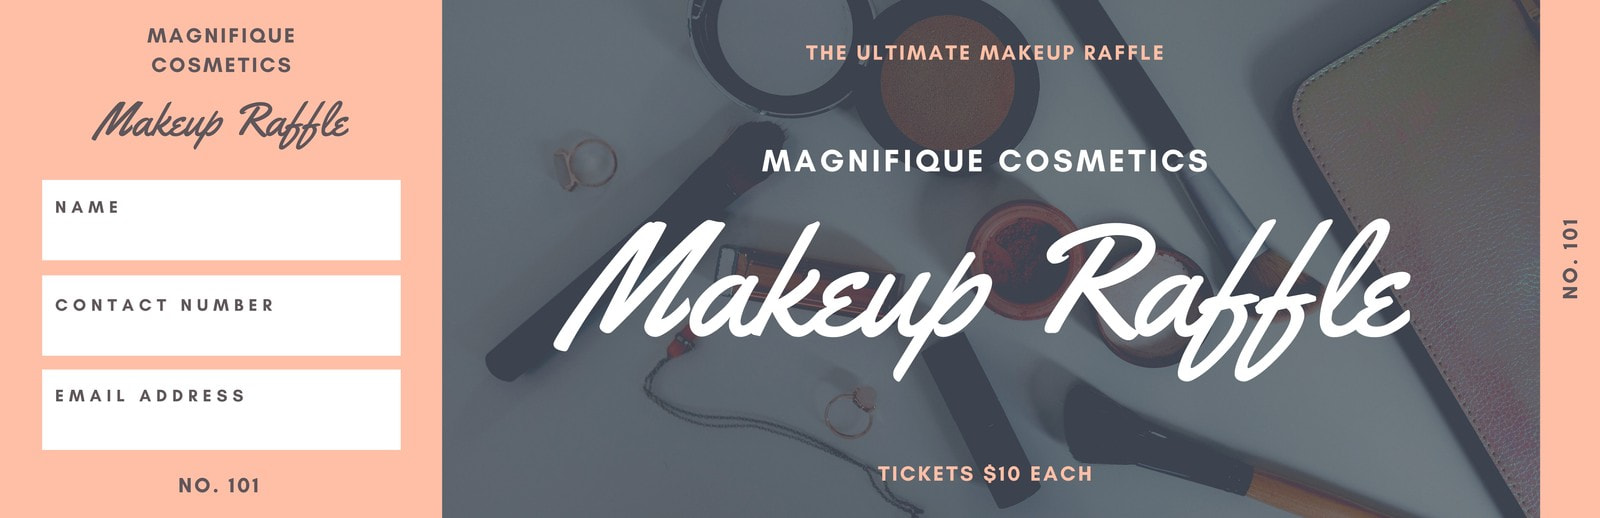 Peach and Grey Makeup Raffle Ticket